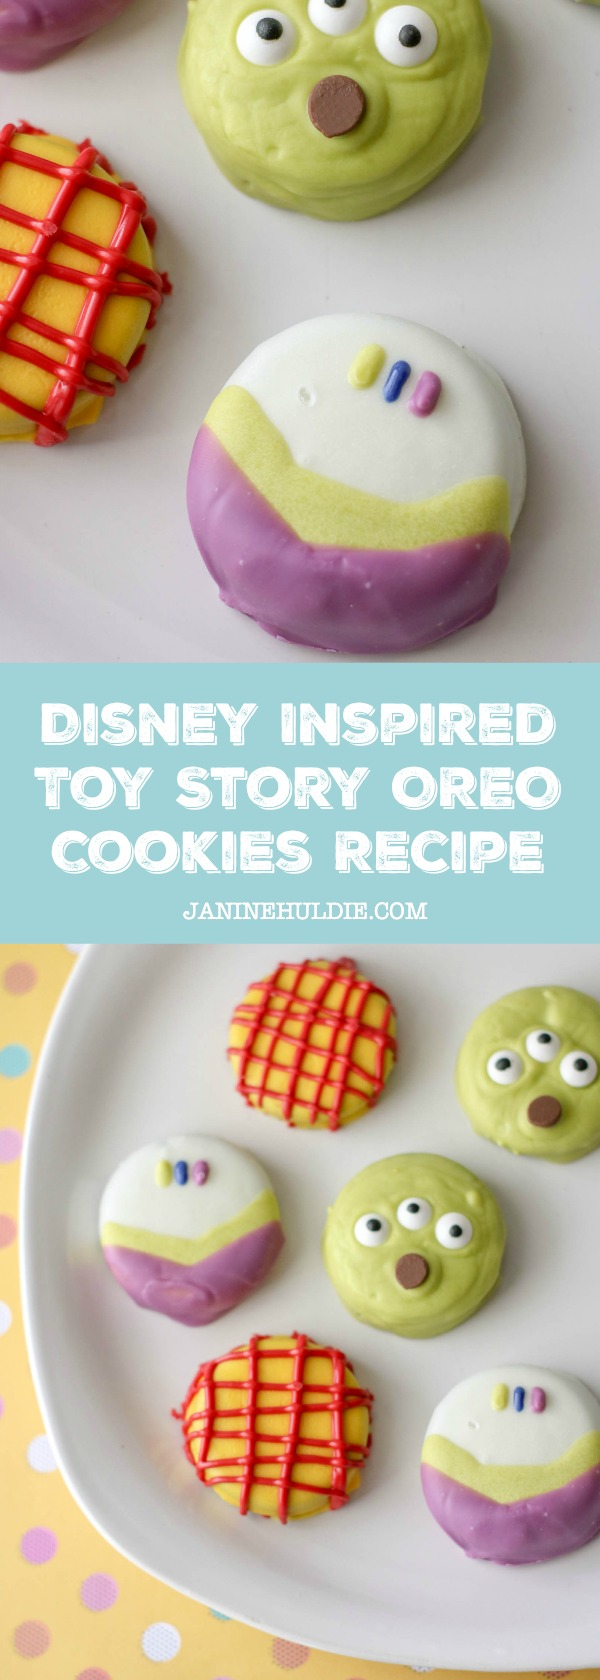 Disney Inspired Toy Story OREO Cookies Recipe